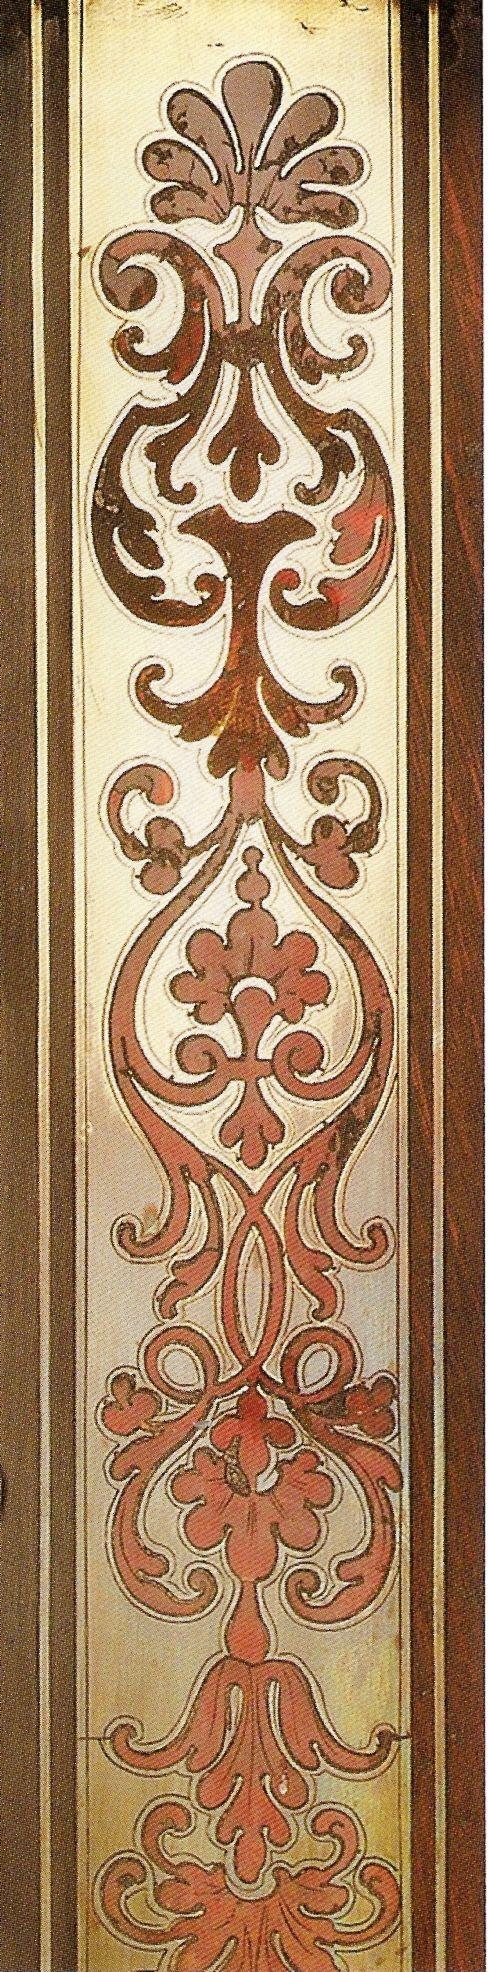 ❤ cenefa ornamental